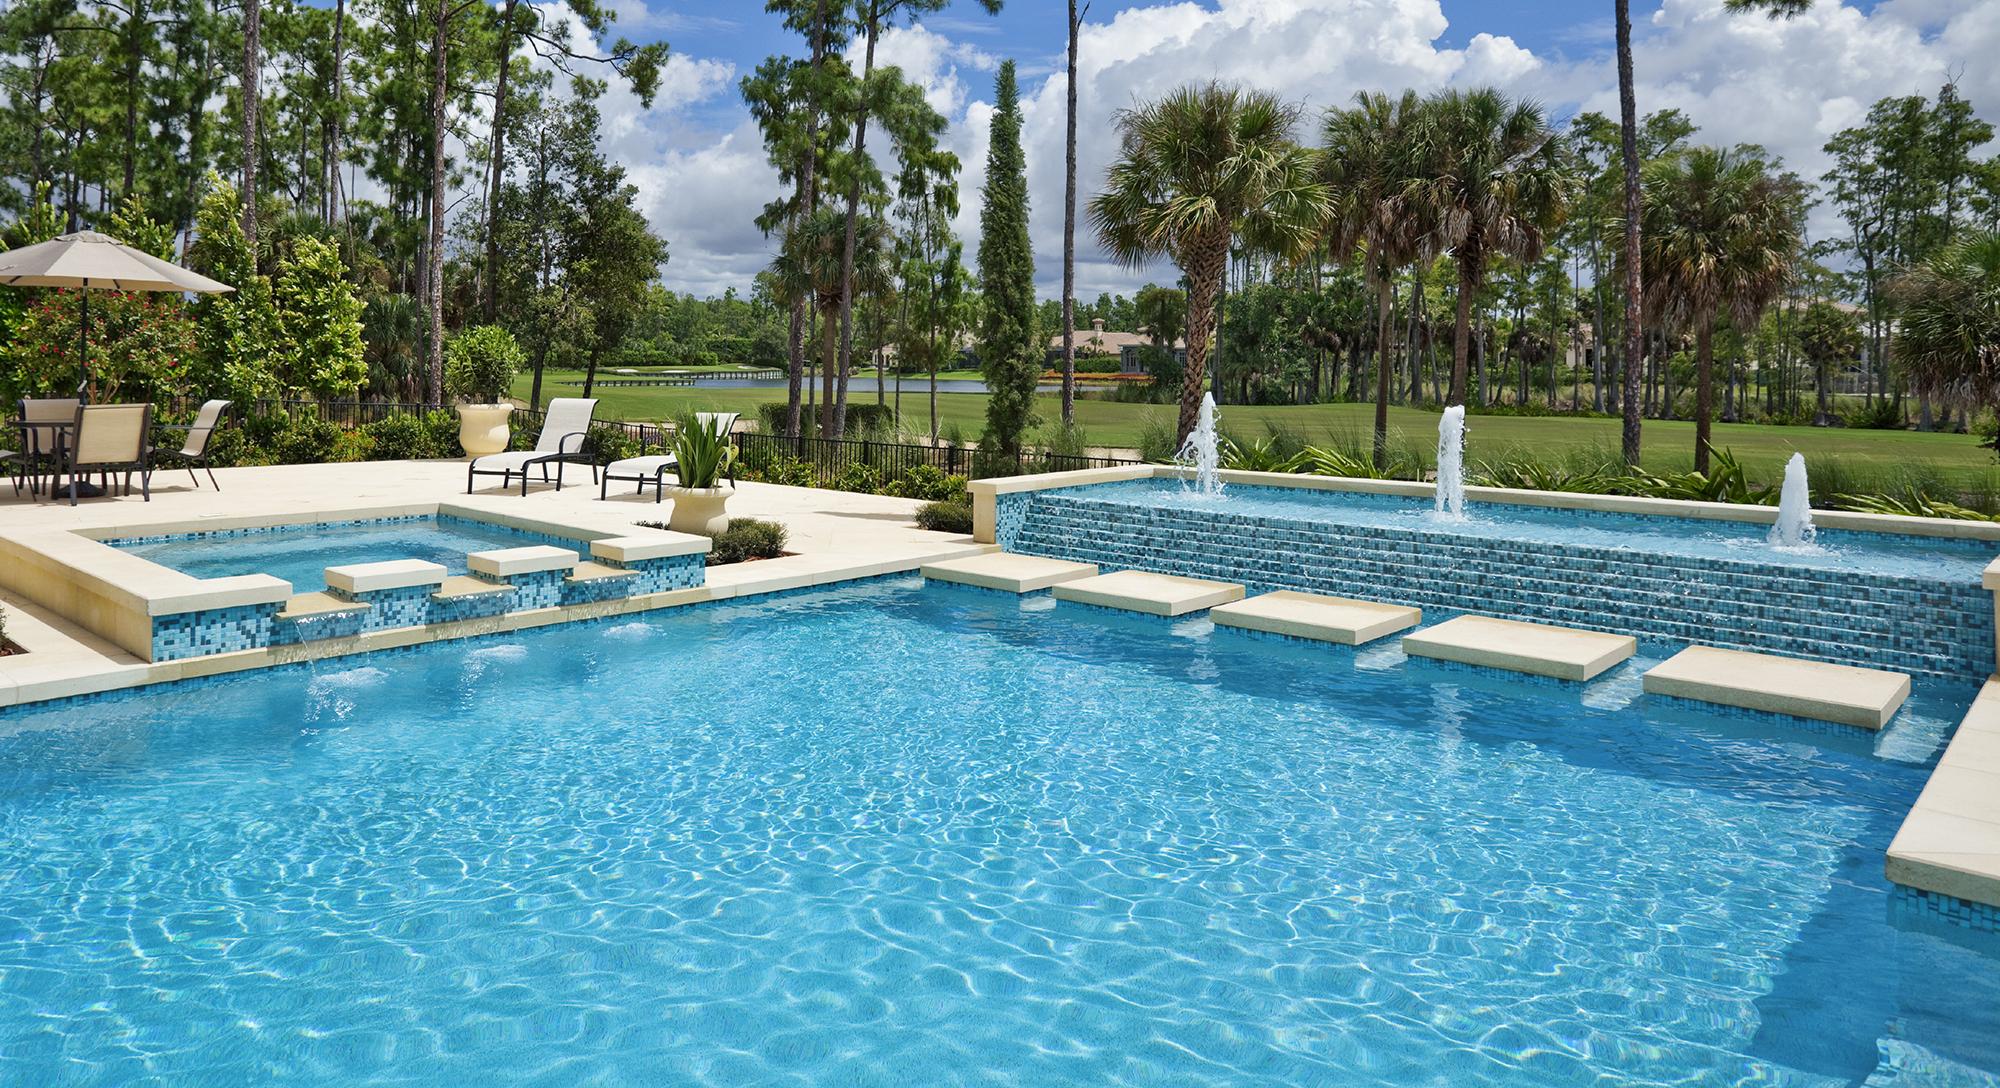 Energy efficiency jandy pro series - Most energy efficient swimming pool pump ...